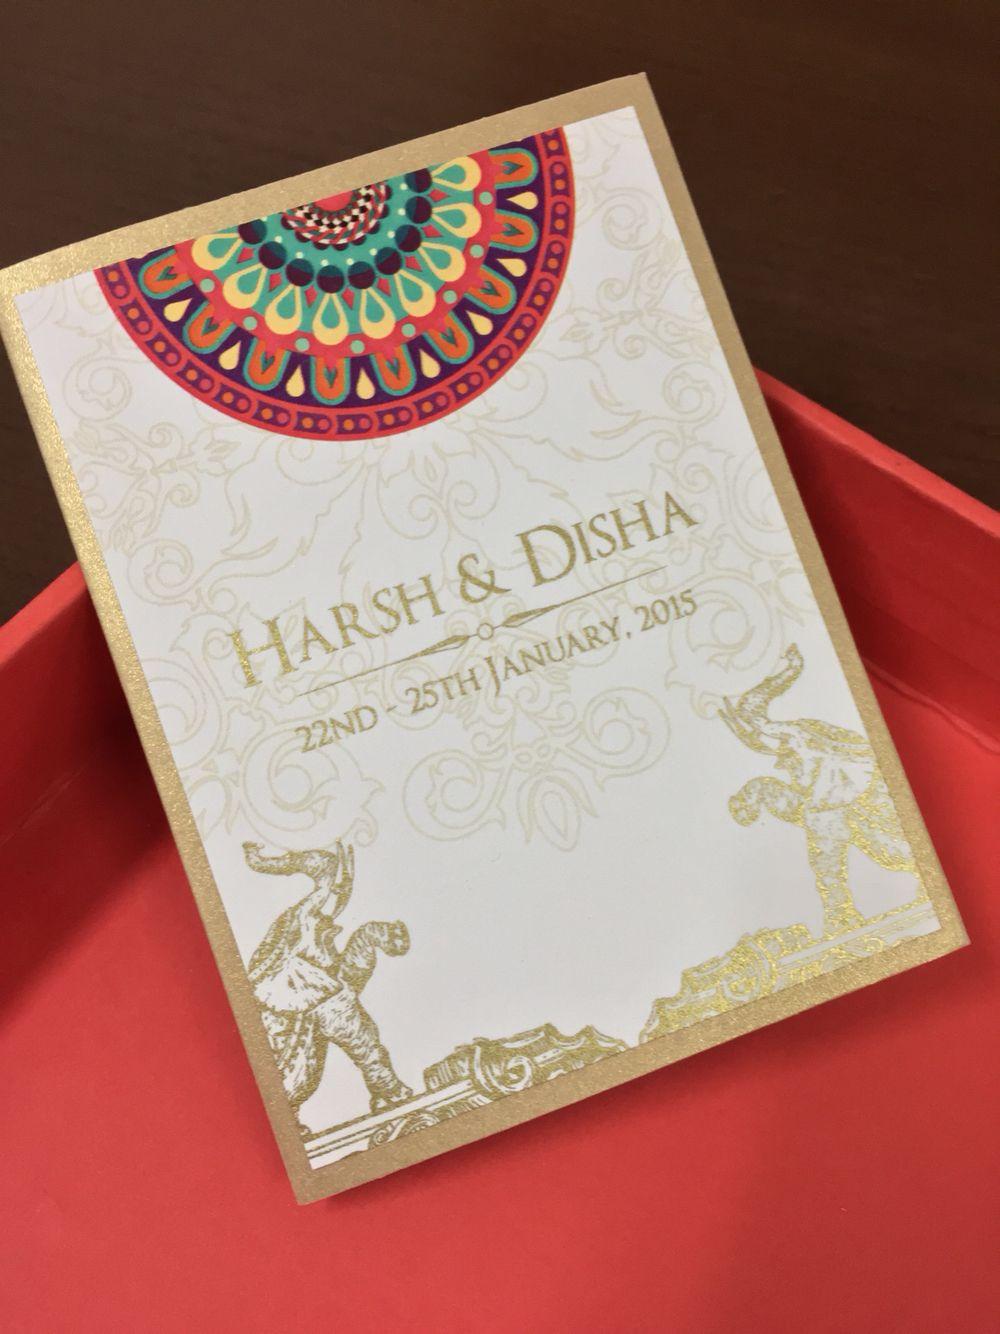 wedding card invitation Wedding Invitations cards Indian wedding cards invites Wedding Stationery Customized invitations